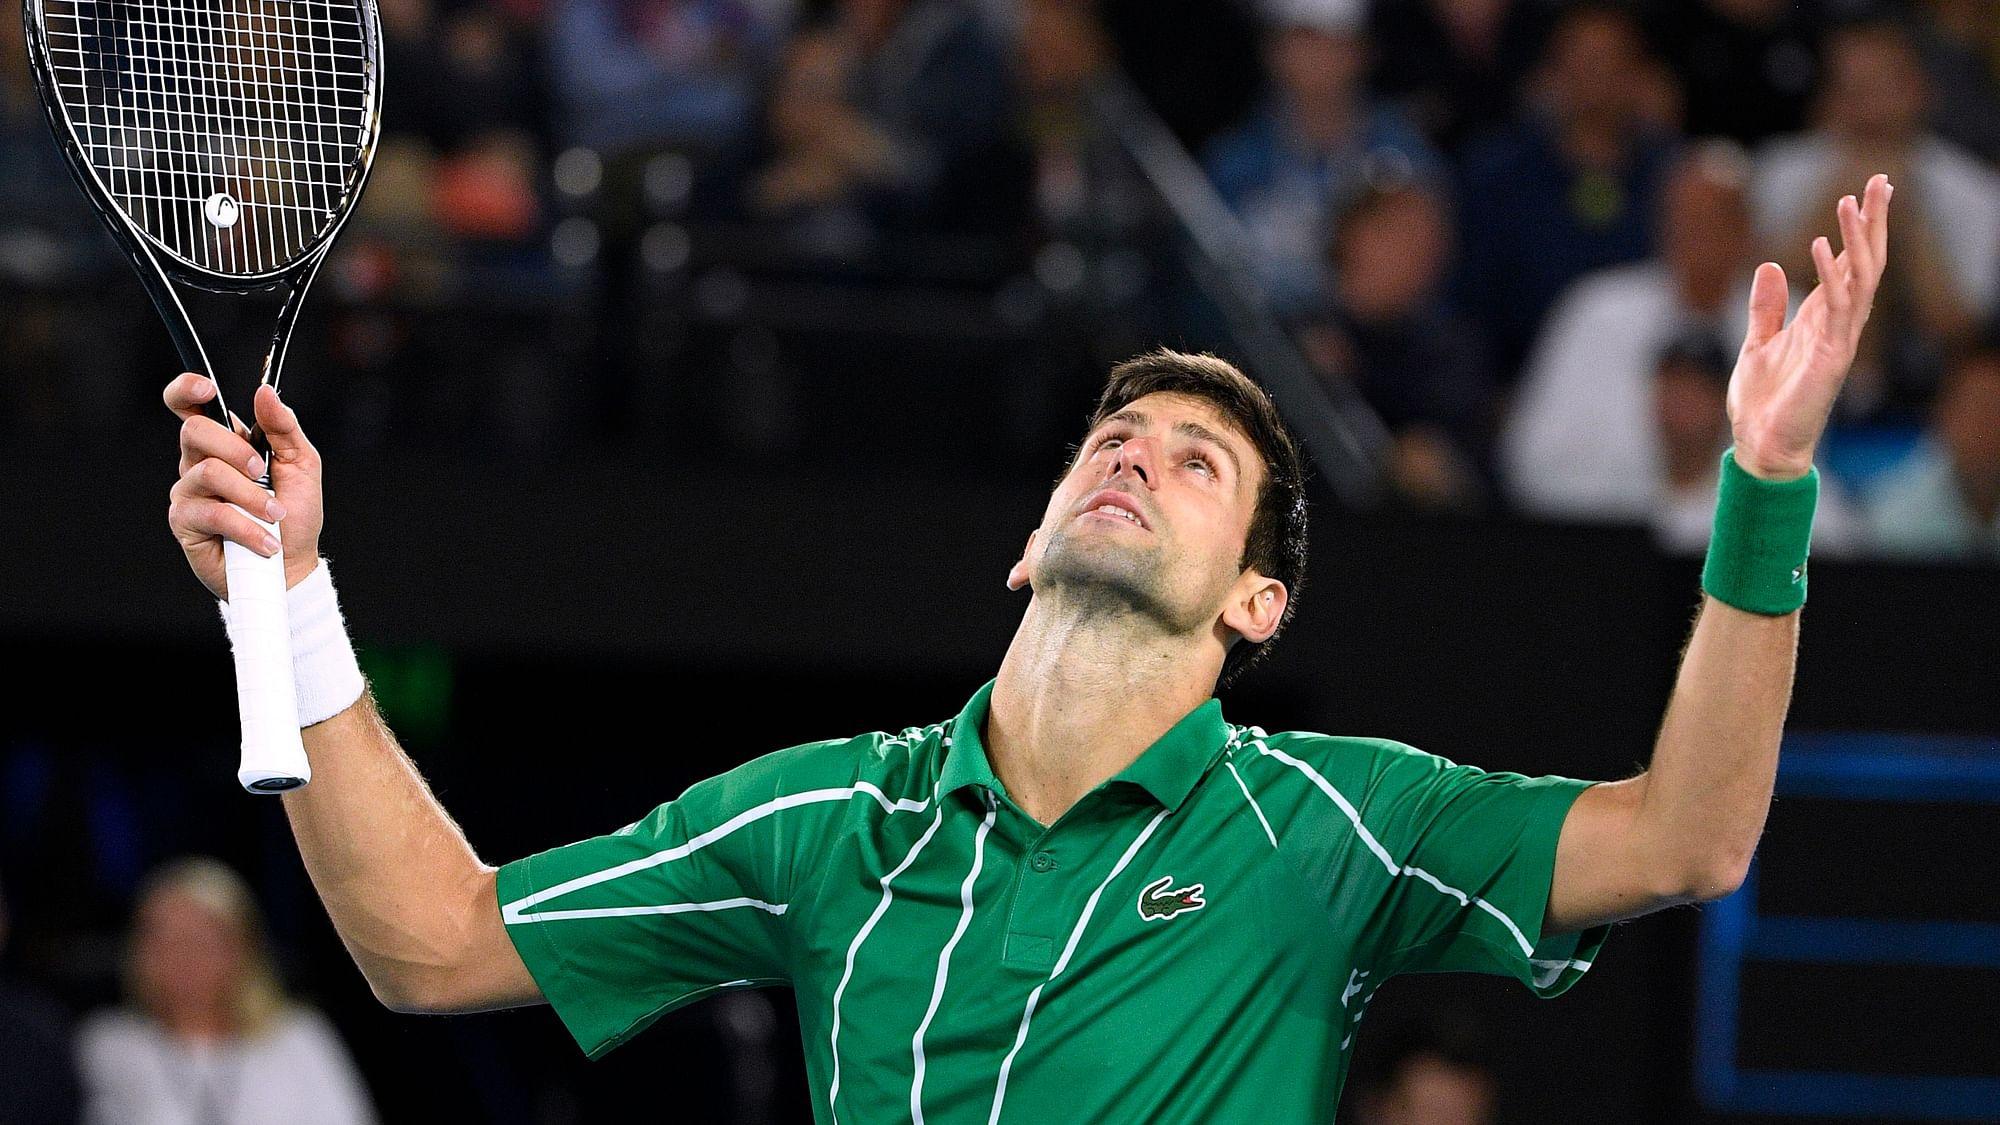 Novak Djokovic Pays Tribute To Kobe Bryant After Australian Open Win